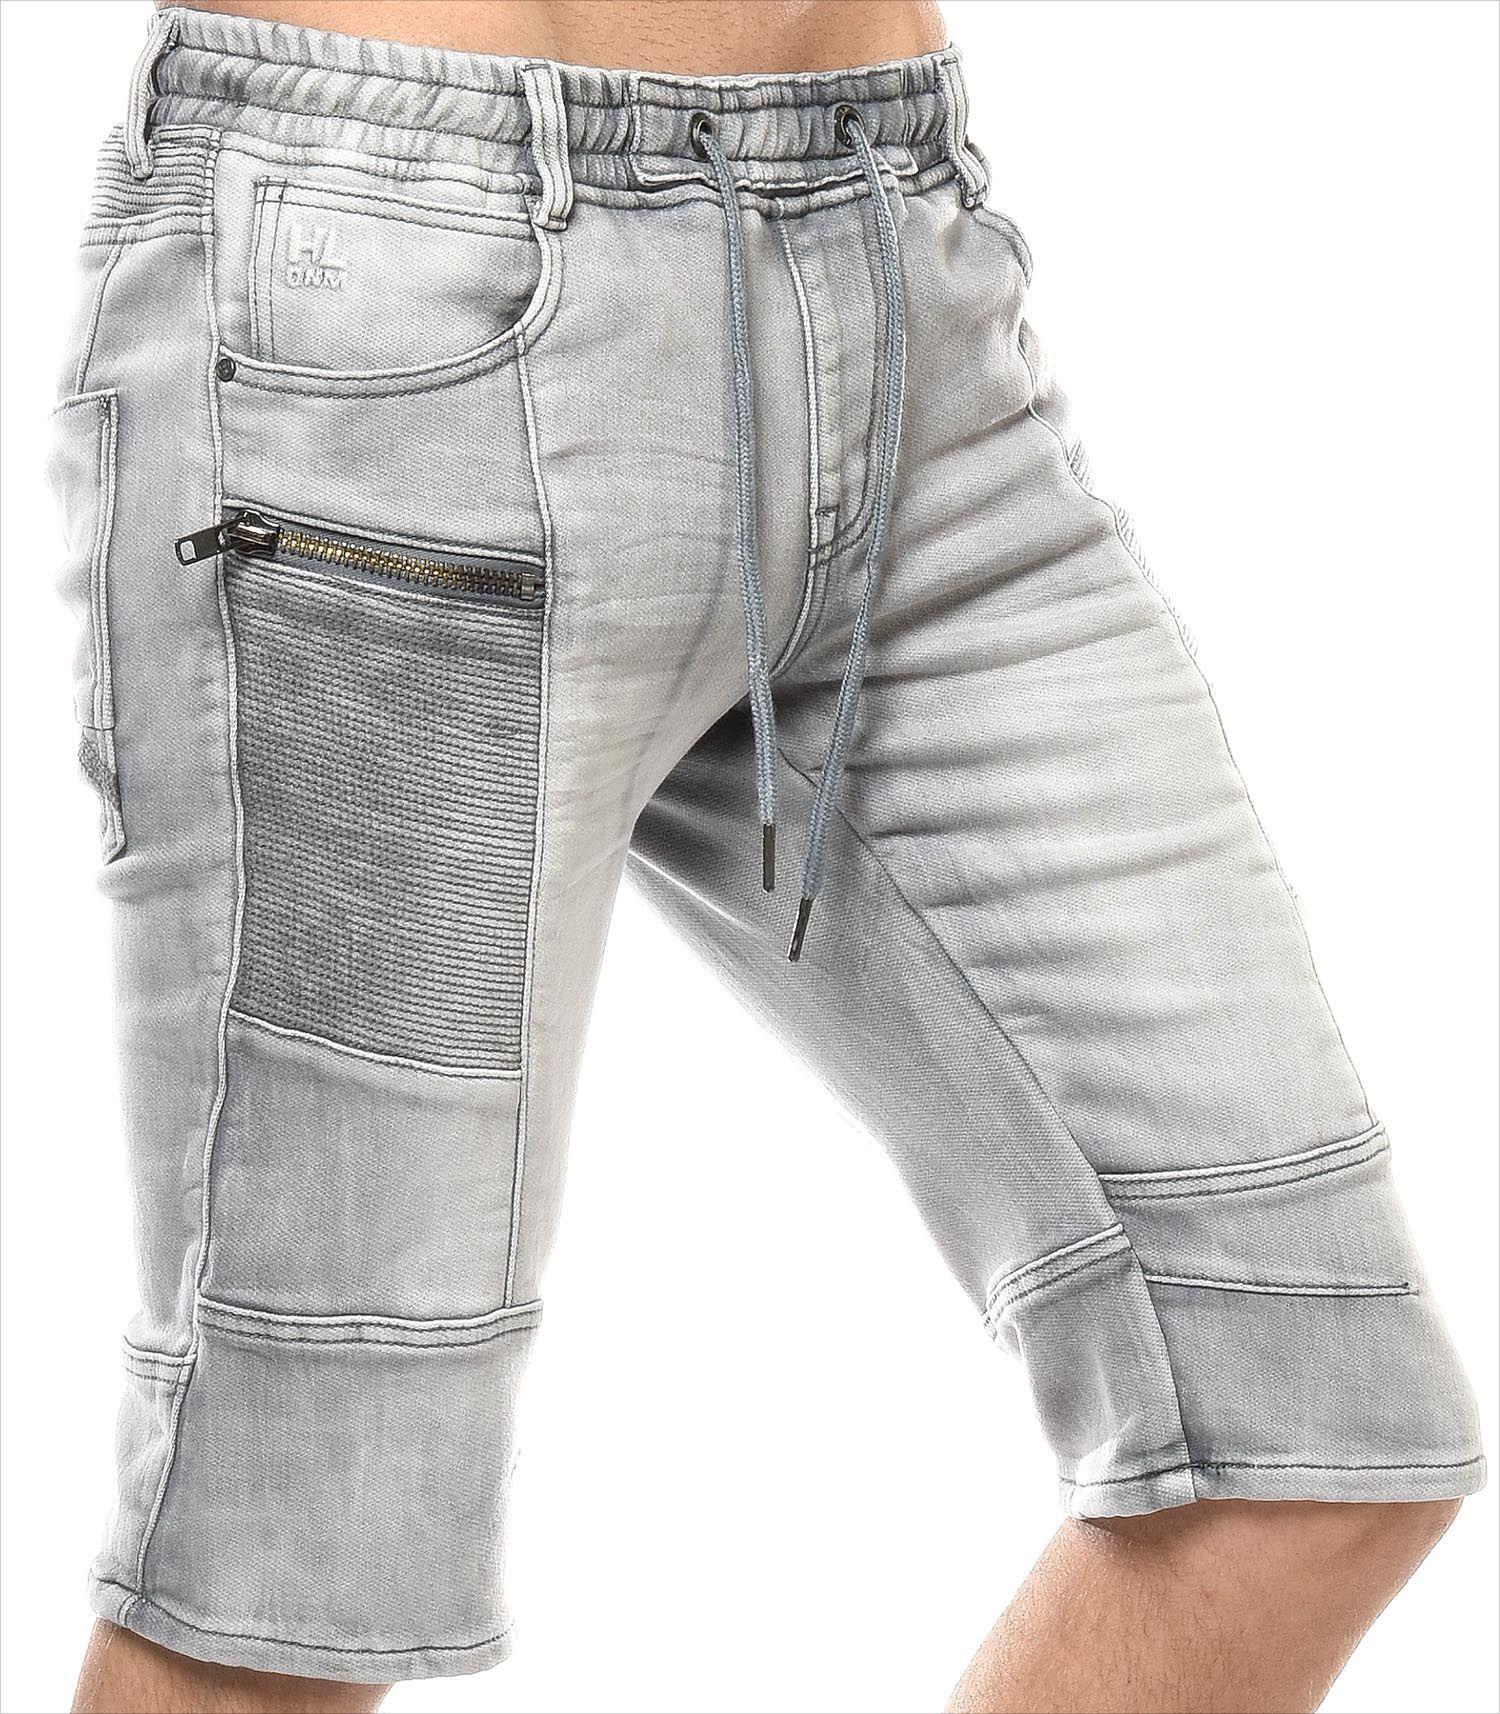 0b82e53390ab7 H.landers Short jeans Jogg Biker HL Bunbury Mode Homme Biker | Rock ...